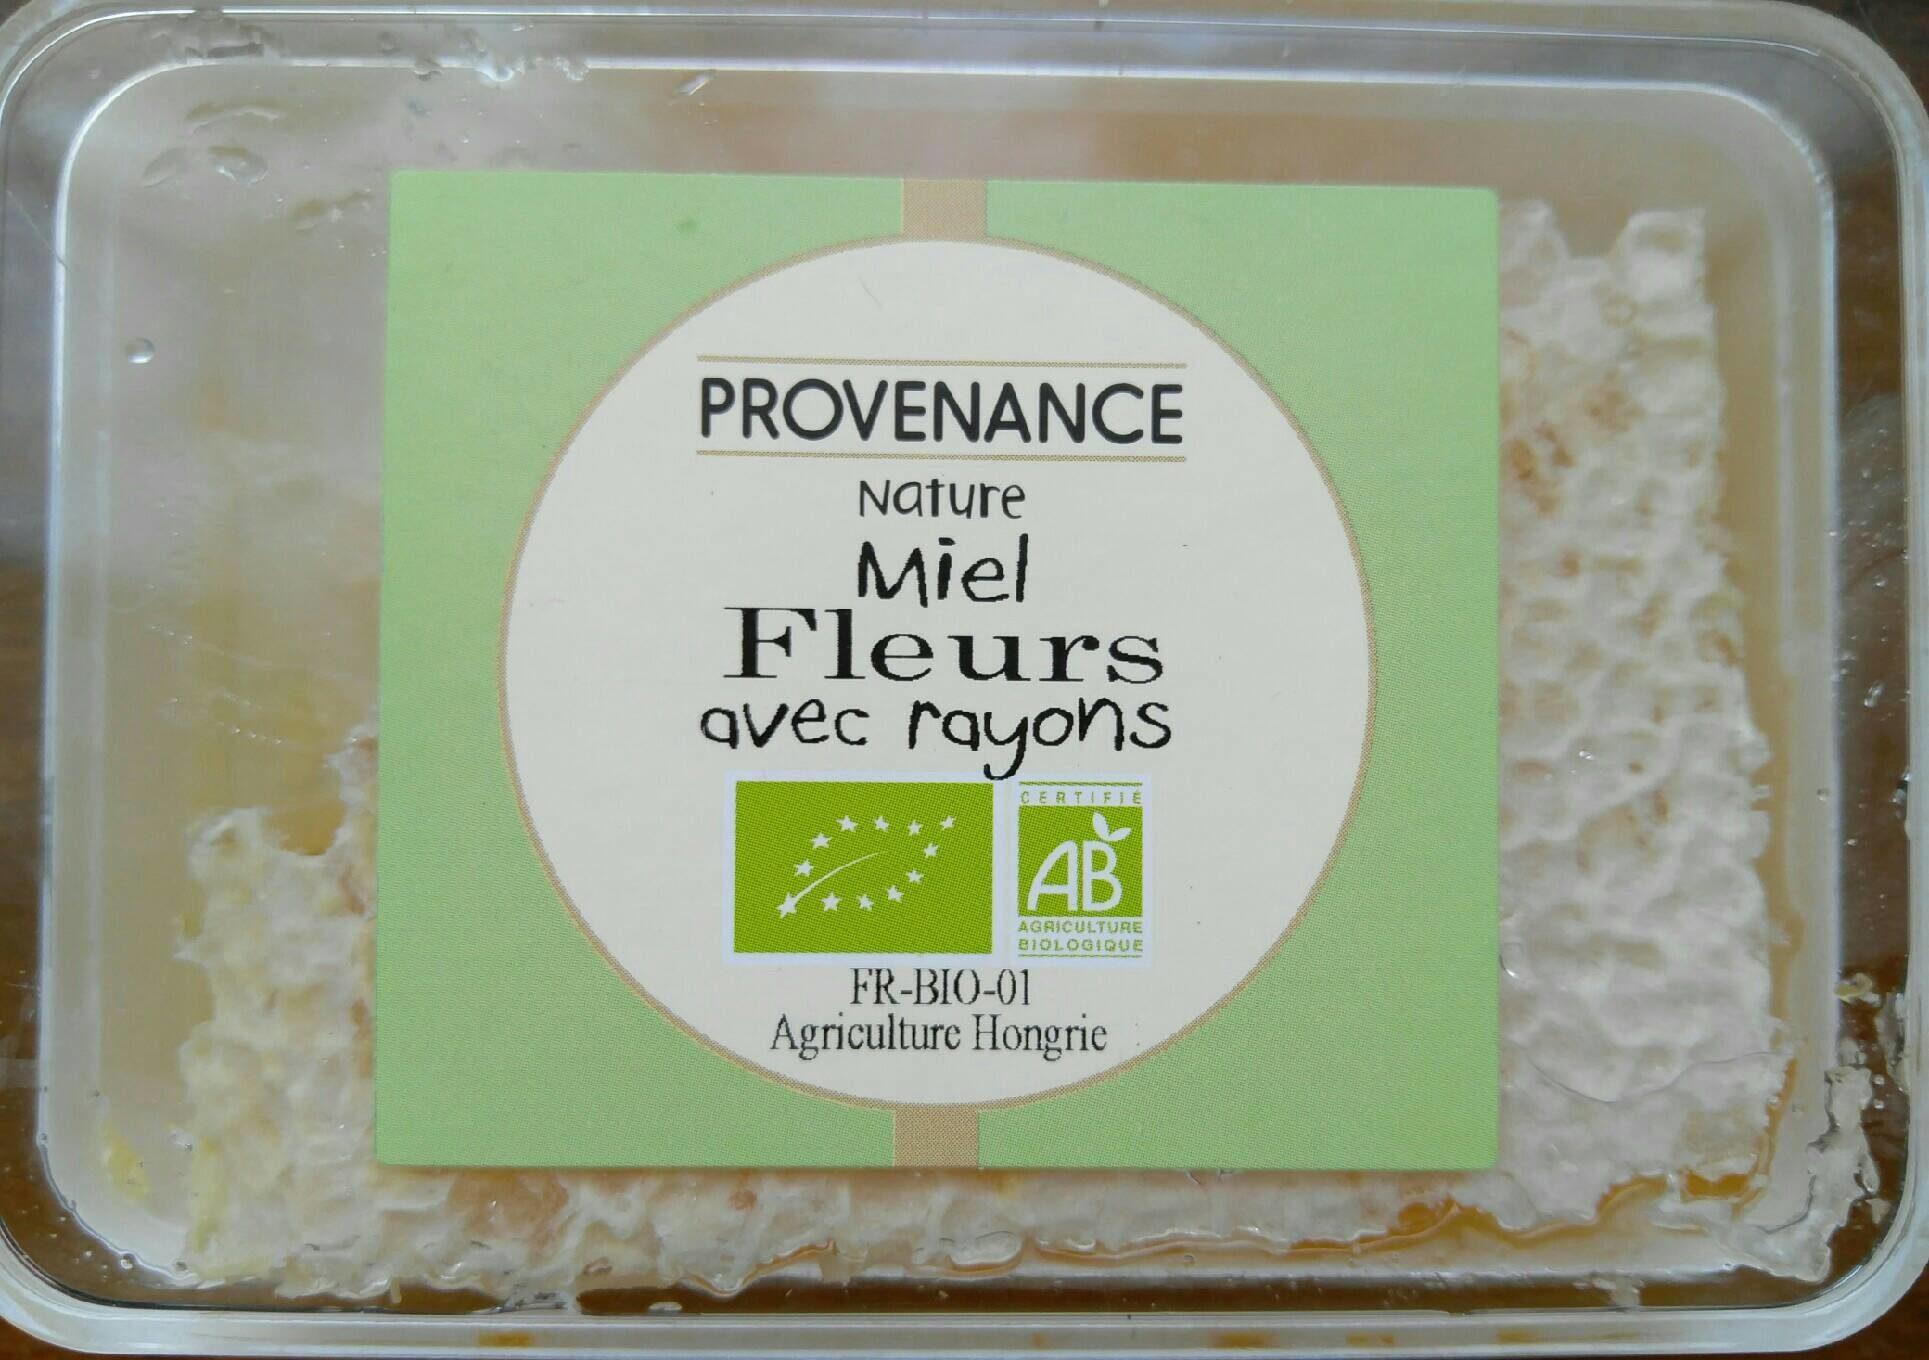 Miel fleur avec rayons - Product